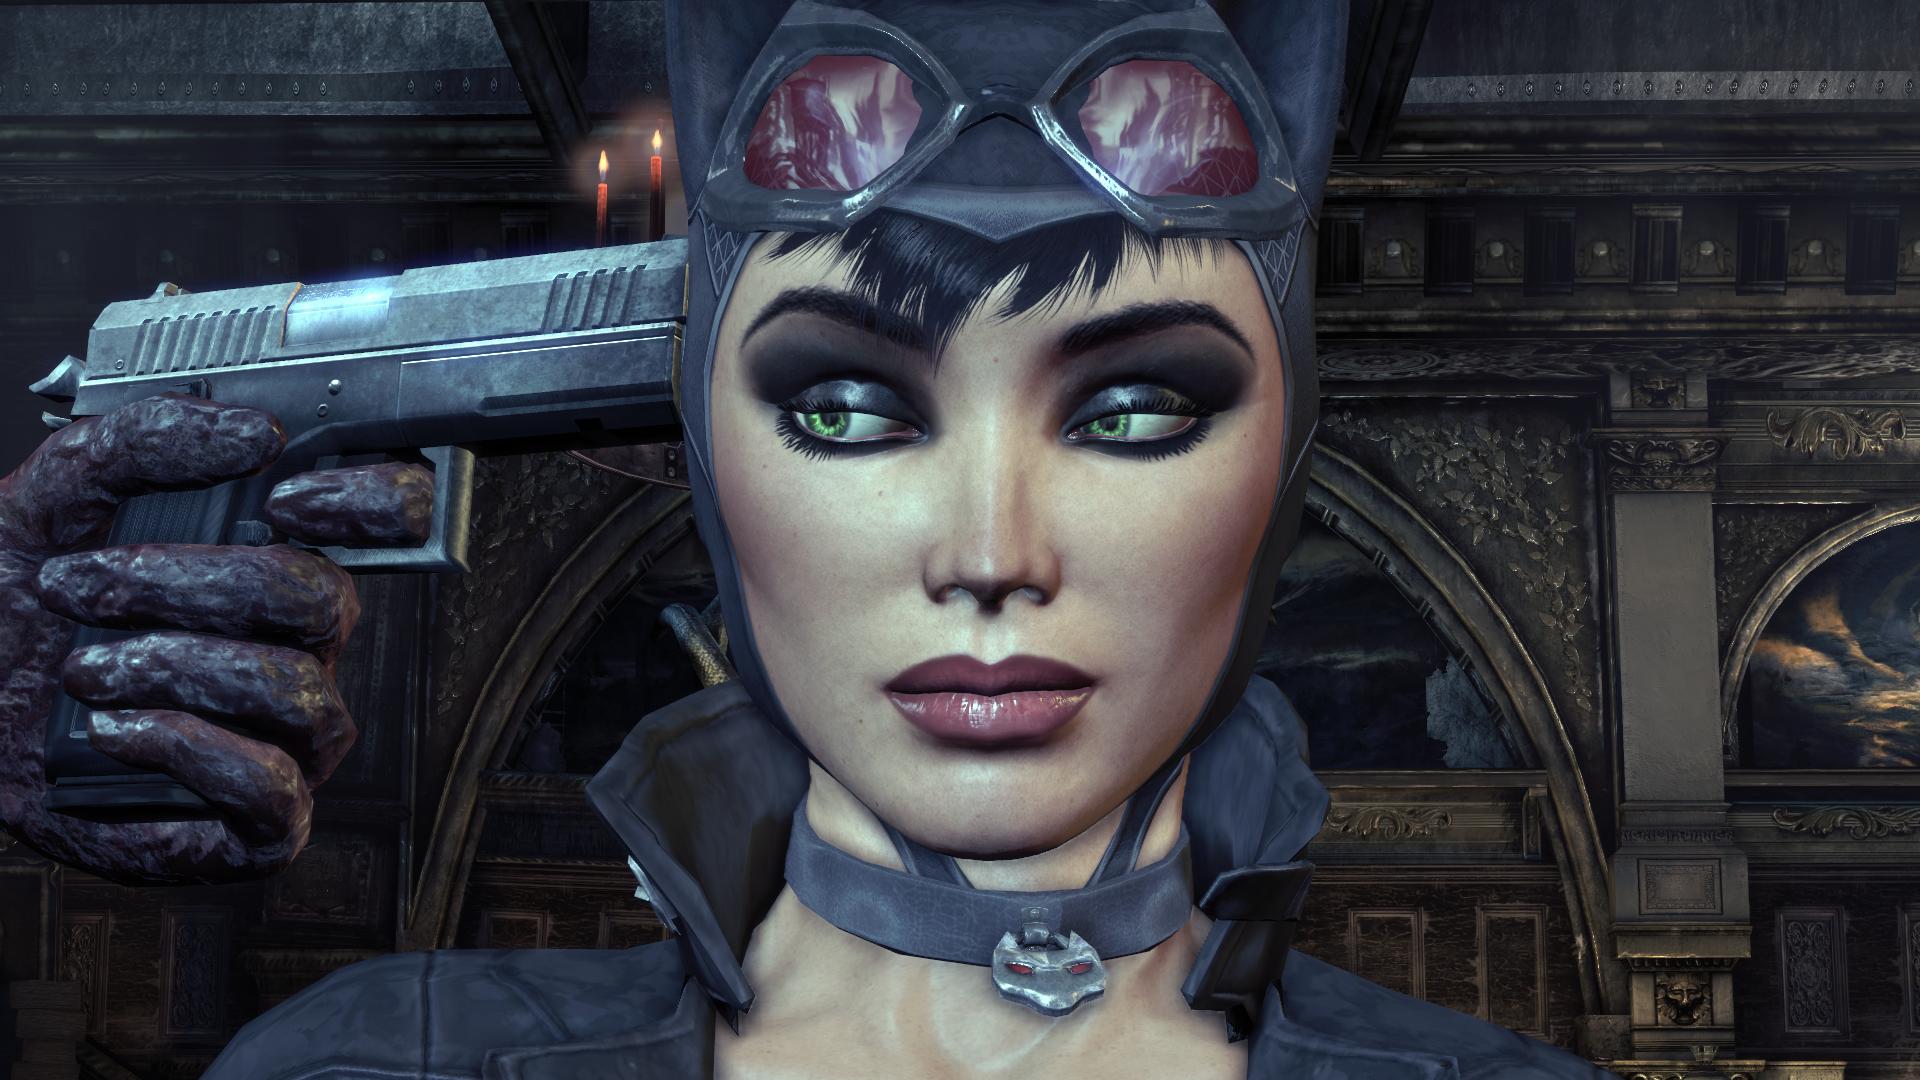 Arkham city cat woman mod pron funny girls